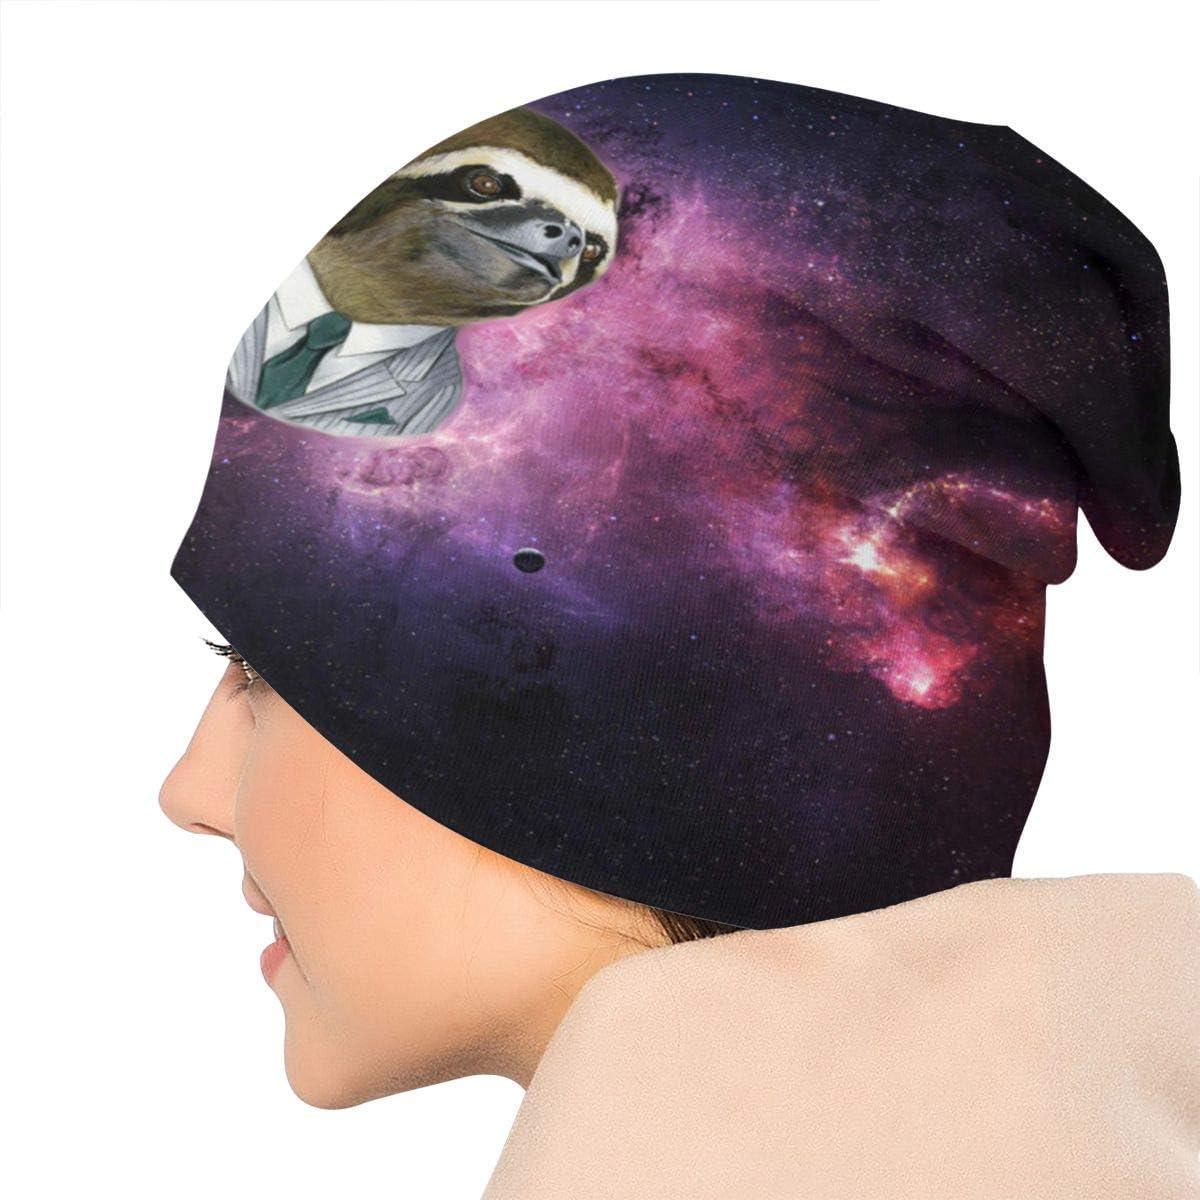 JINGUImao Sloth Space Unisex Warm Hat Knit Hat Skull Cap Beanies Cap